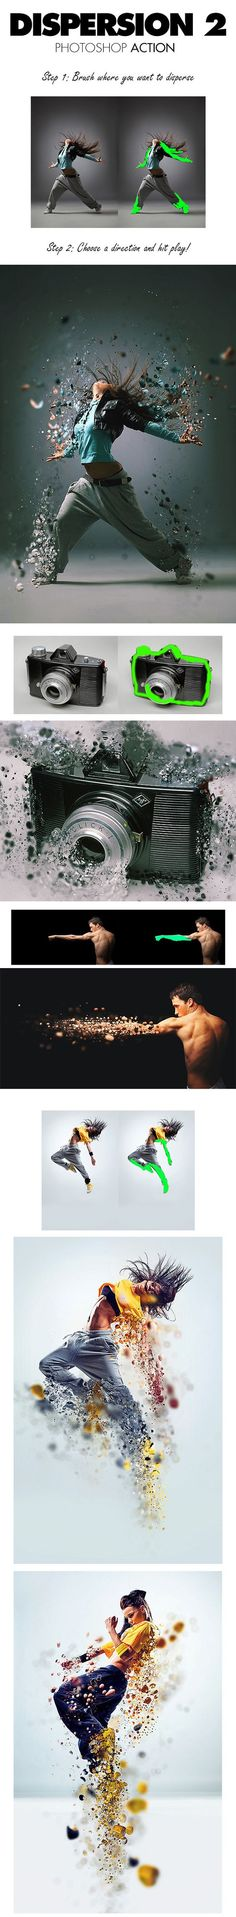 6-Dispersion 2 Photoshop Action: